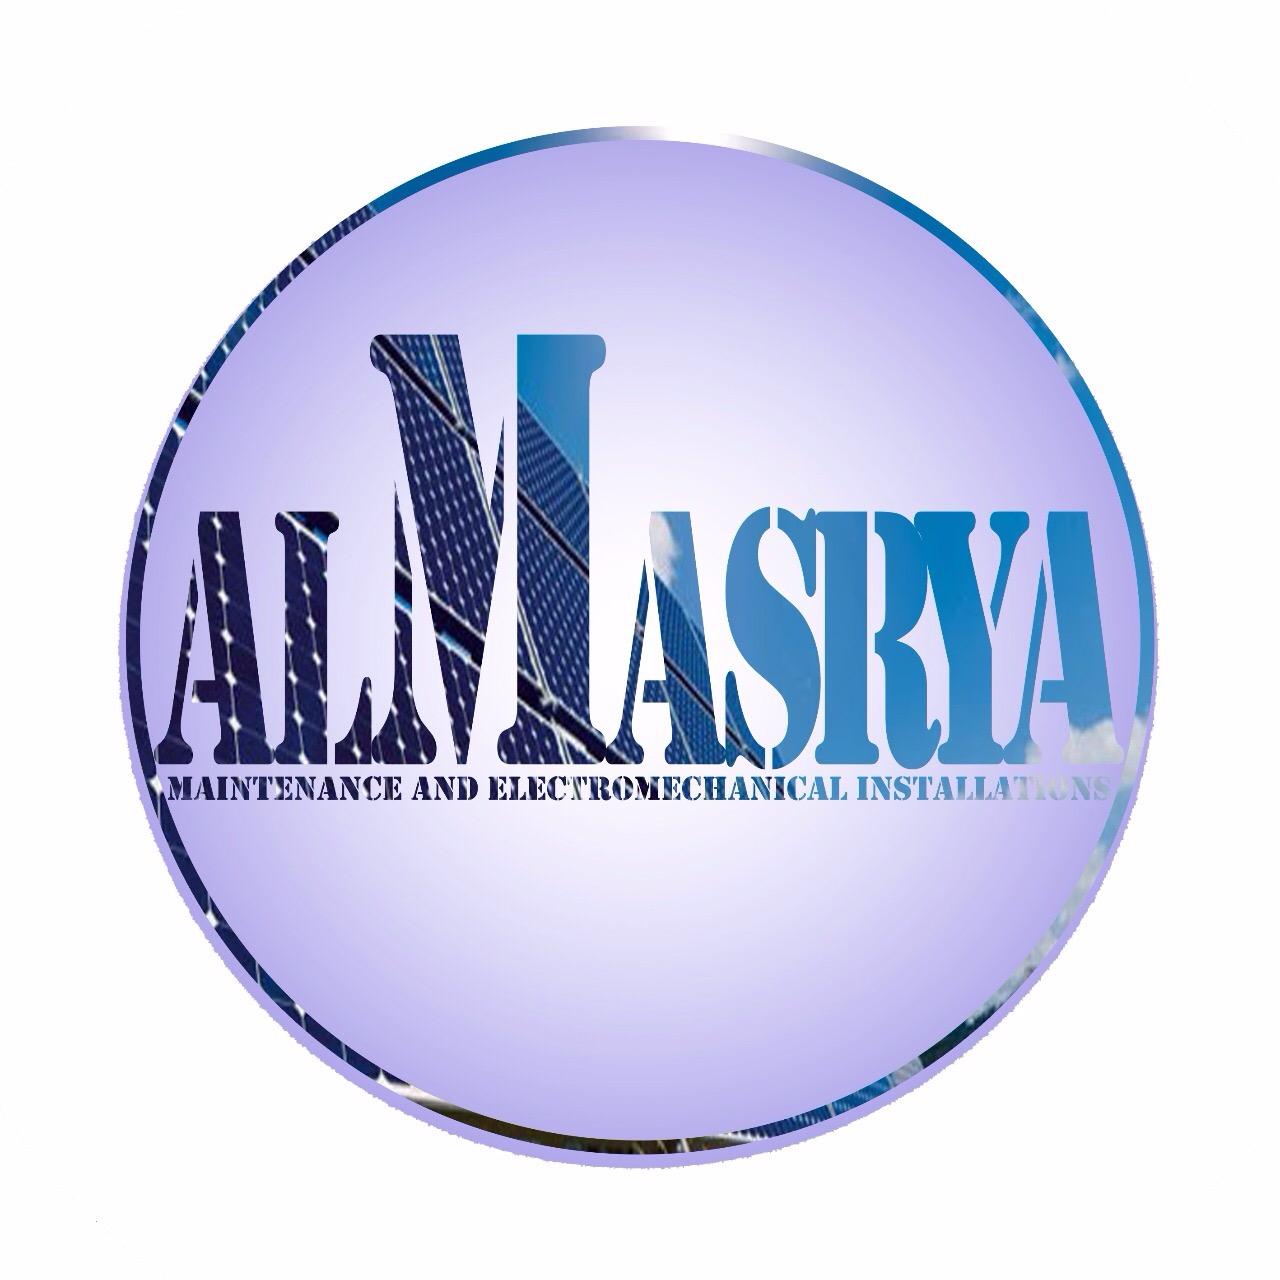 ALMASRYA Maintenance And Installations